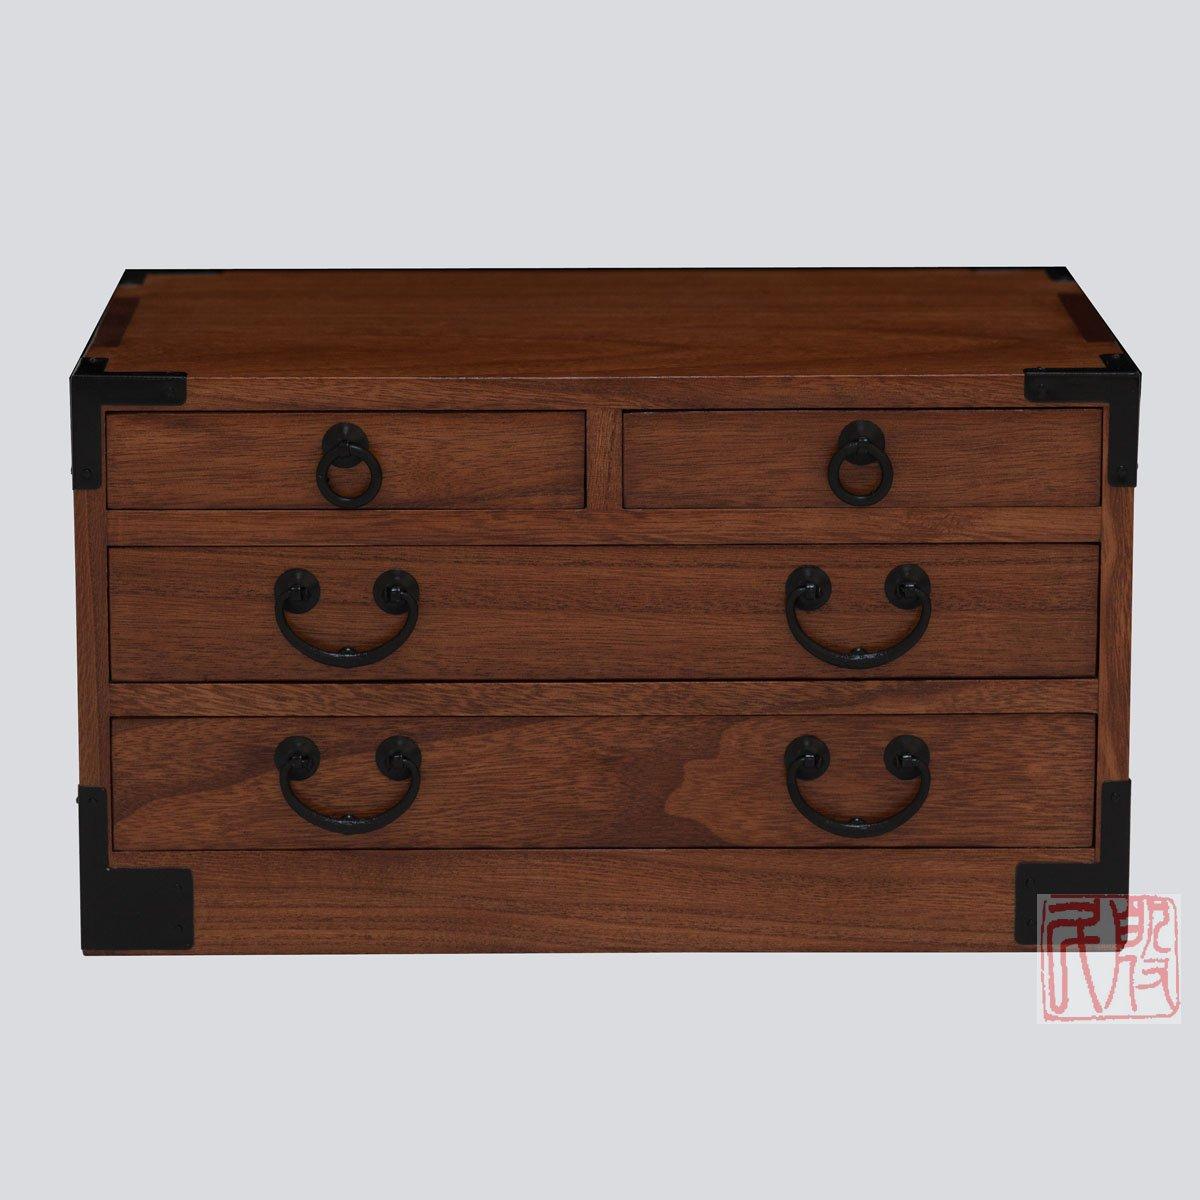 Japanese tansu style jewelry box KB27T, 4 drawers box, solid kiri wood